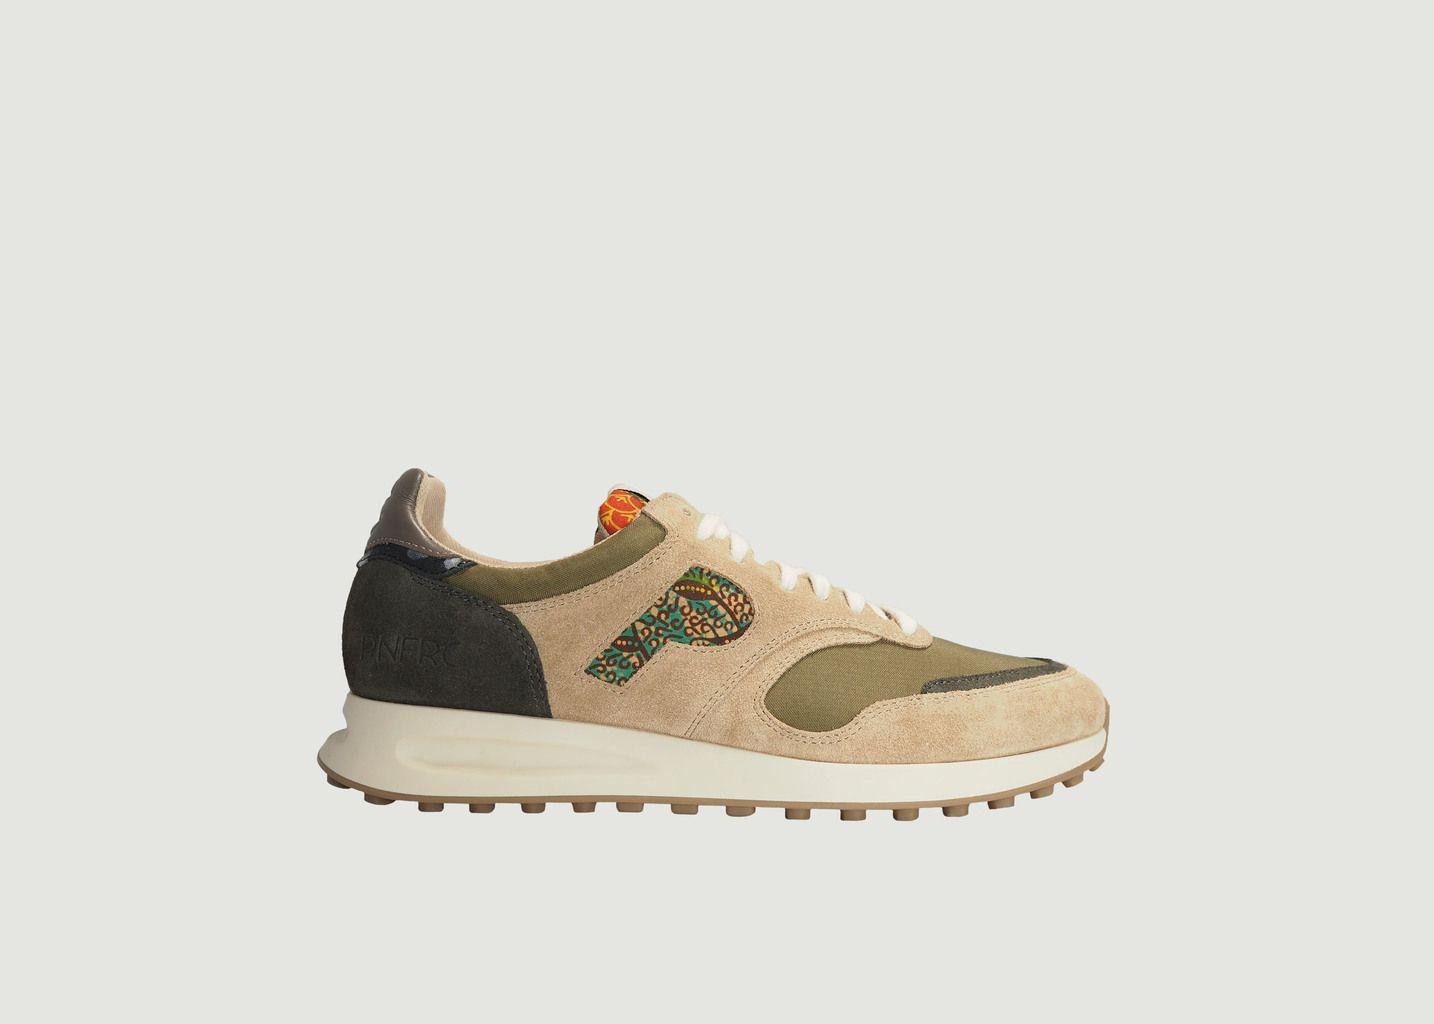 Sneakers de running cuir et tissu Arusha-Sable - Panafrica